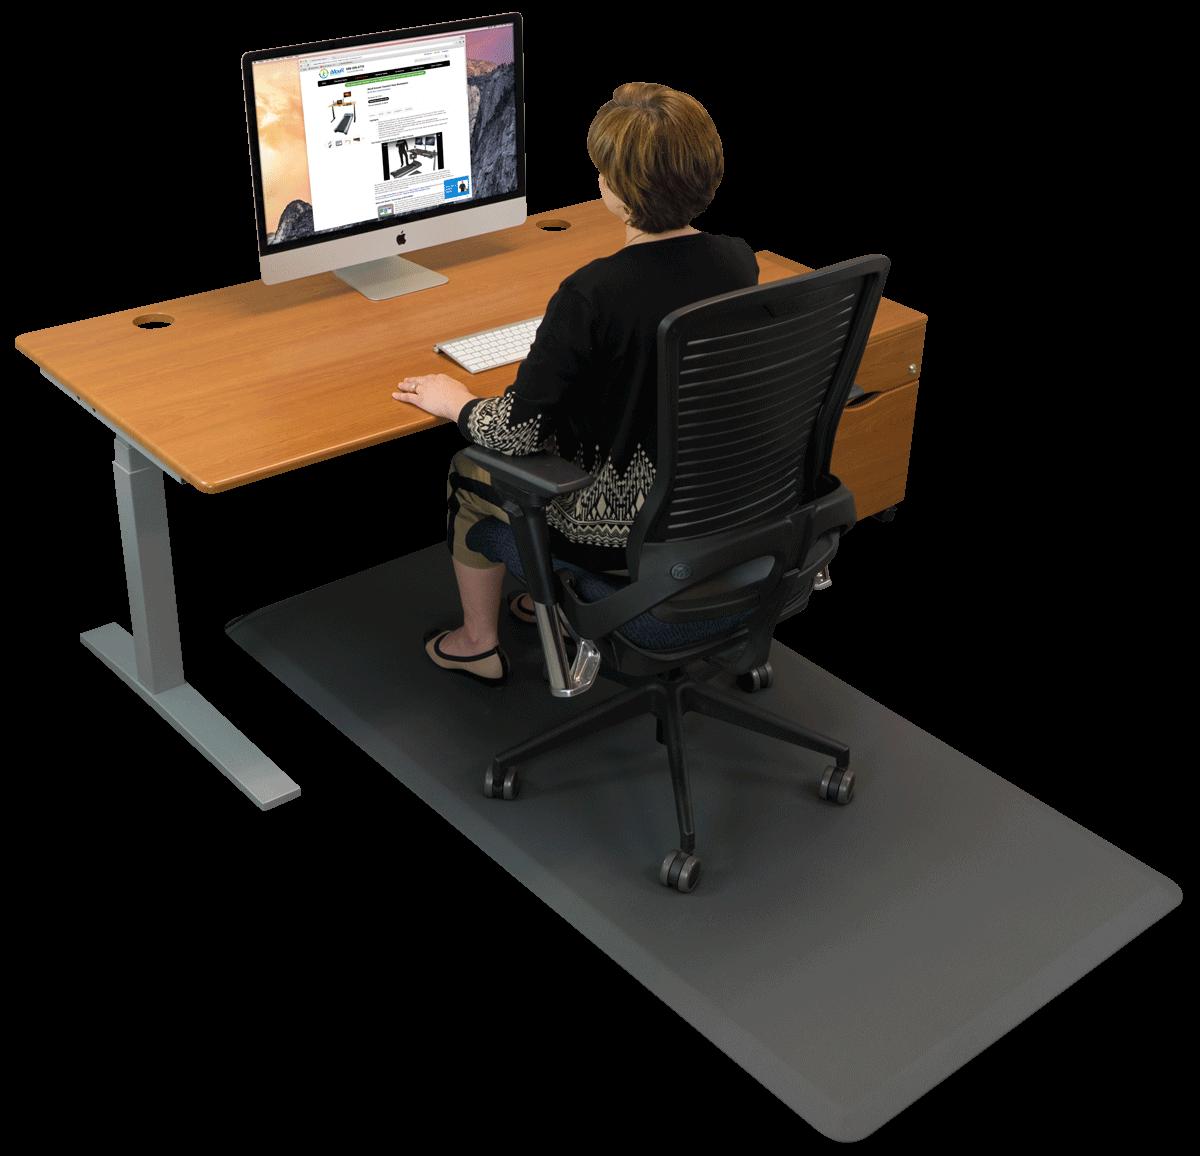 Hybrid Sit-Stand Mats